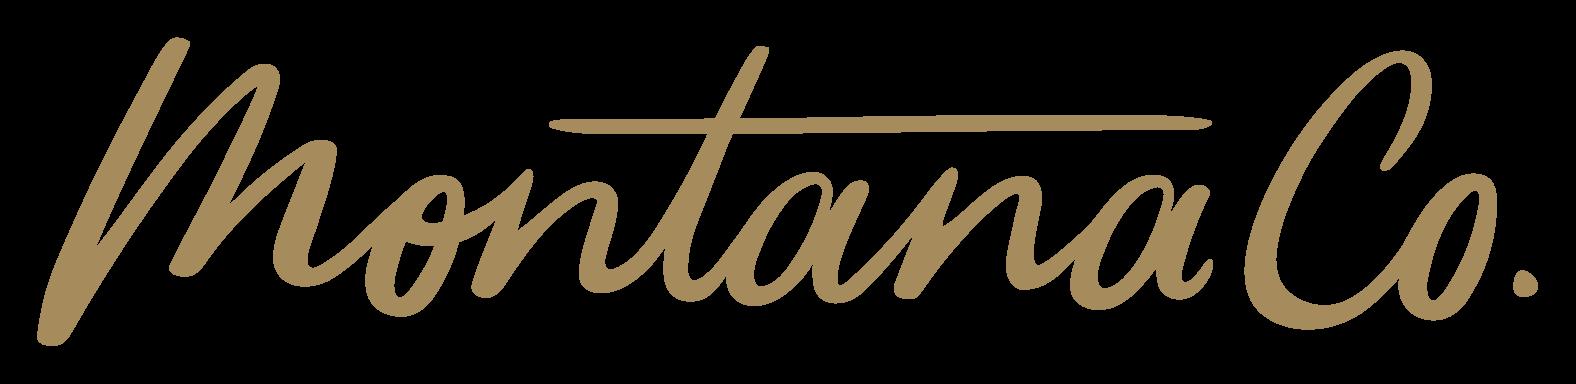 Montana Co Logo